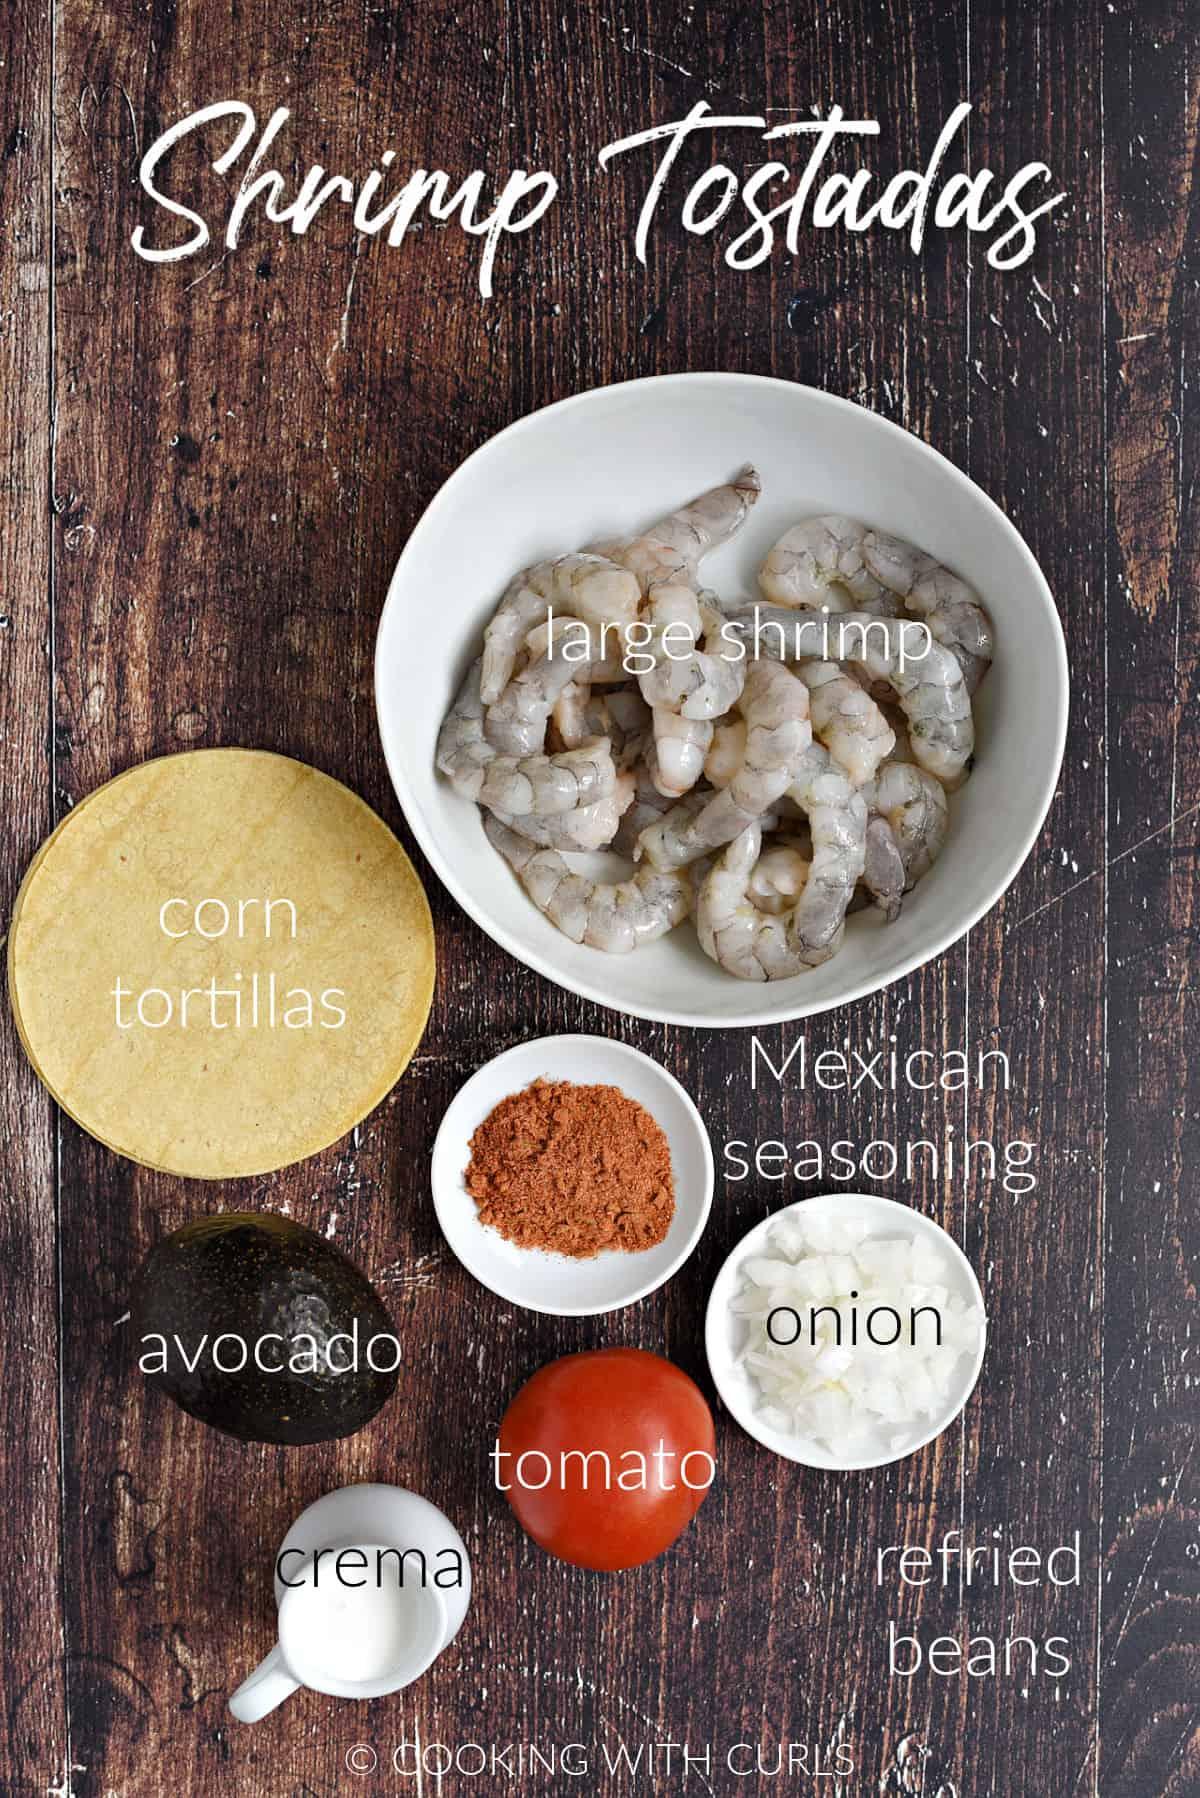 Raw shrimp, corn tortillas, avocado, crema, onion, tomato and seasoning for Shrimp Tostadas.